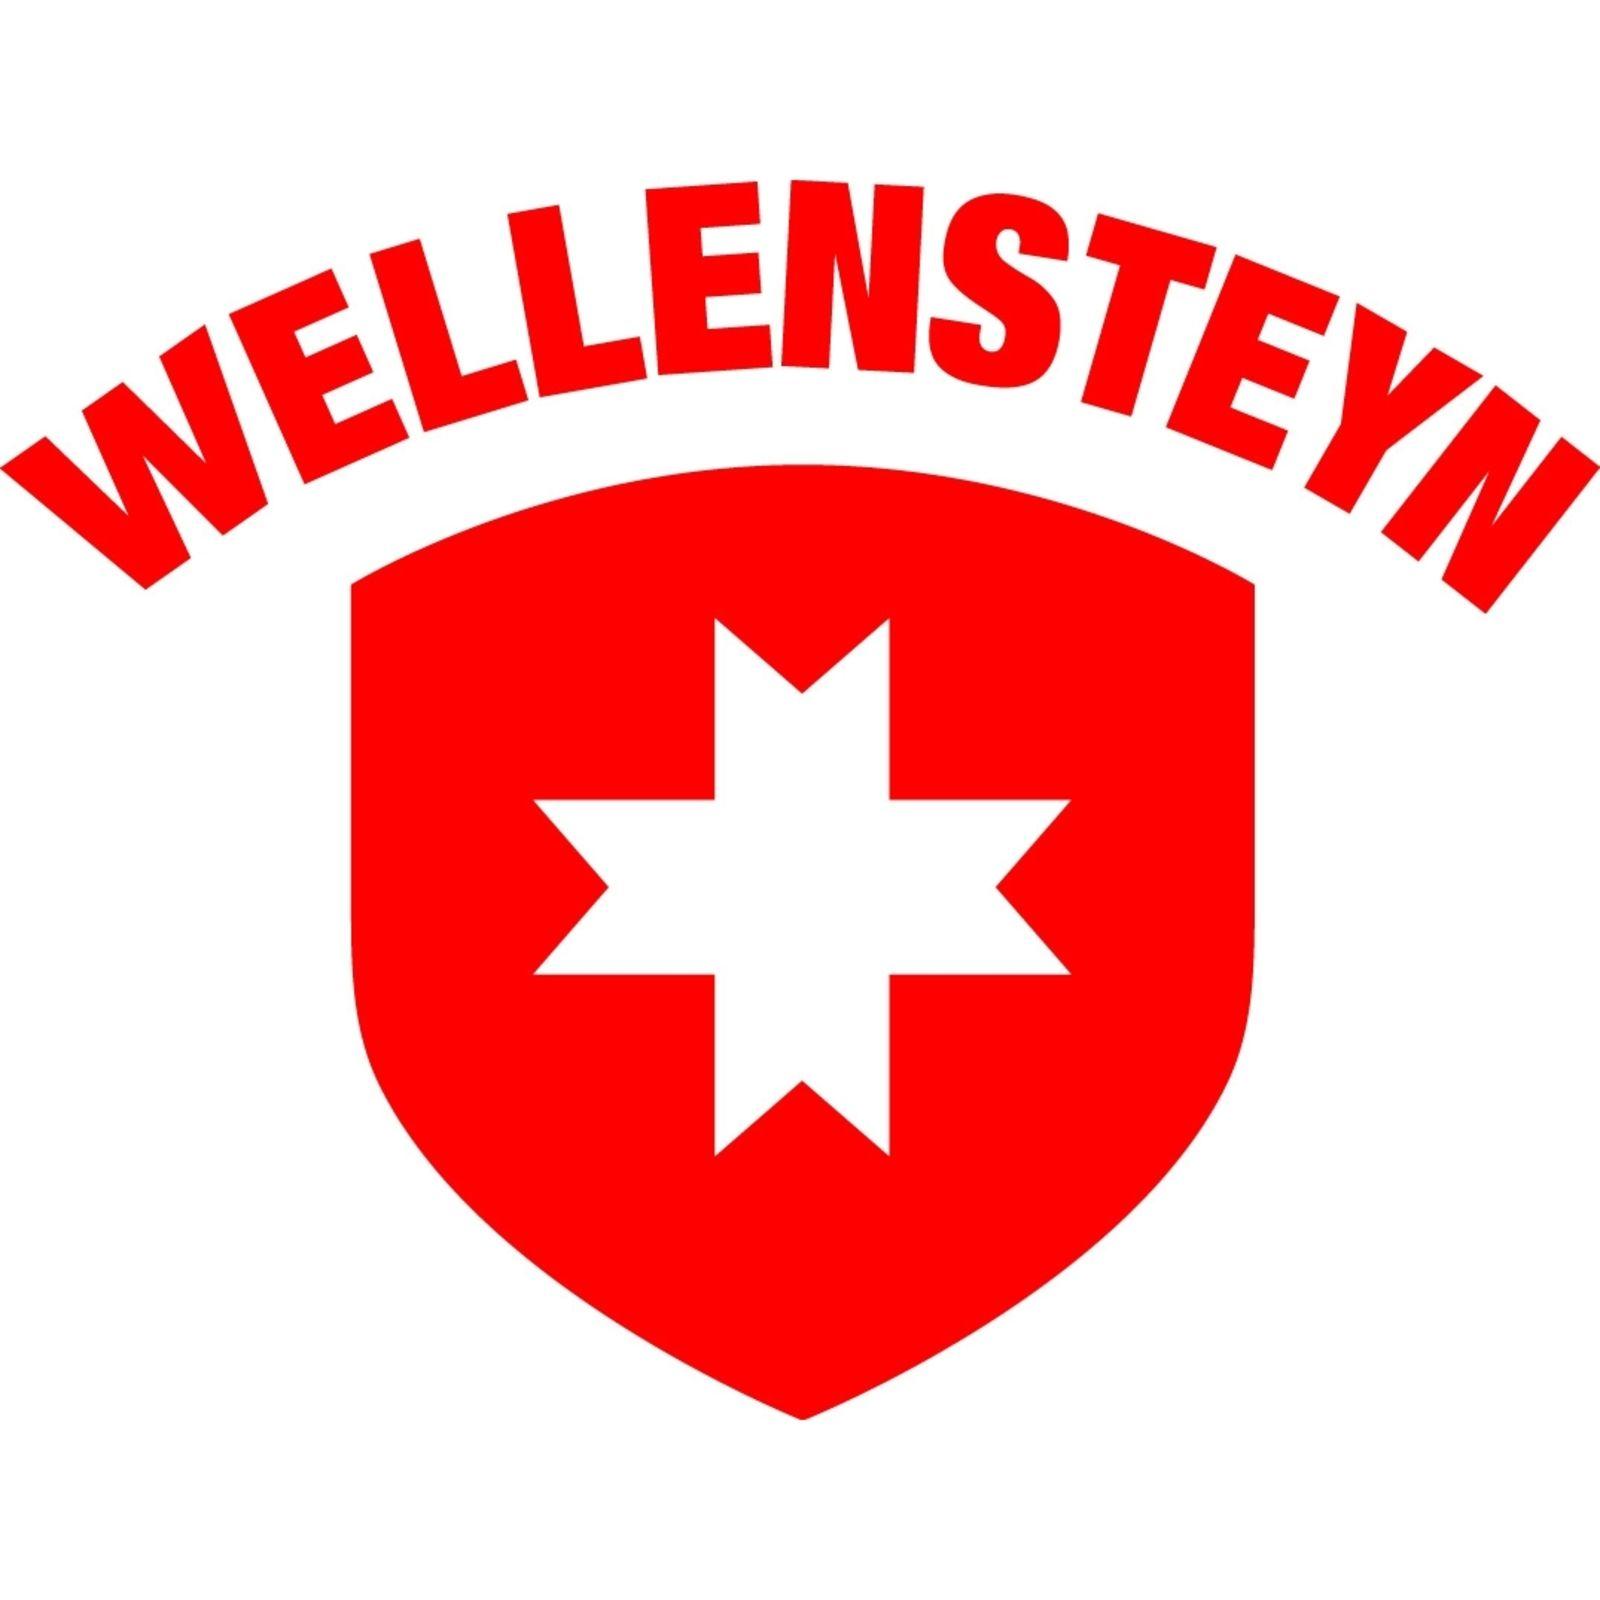 WELLENSTEYN (Image 1)